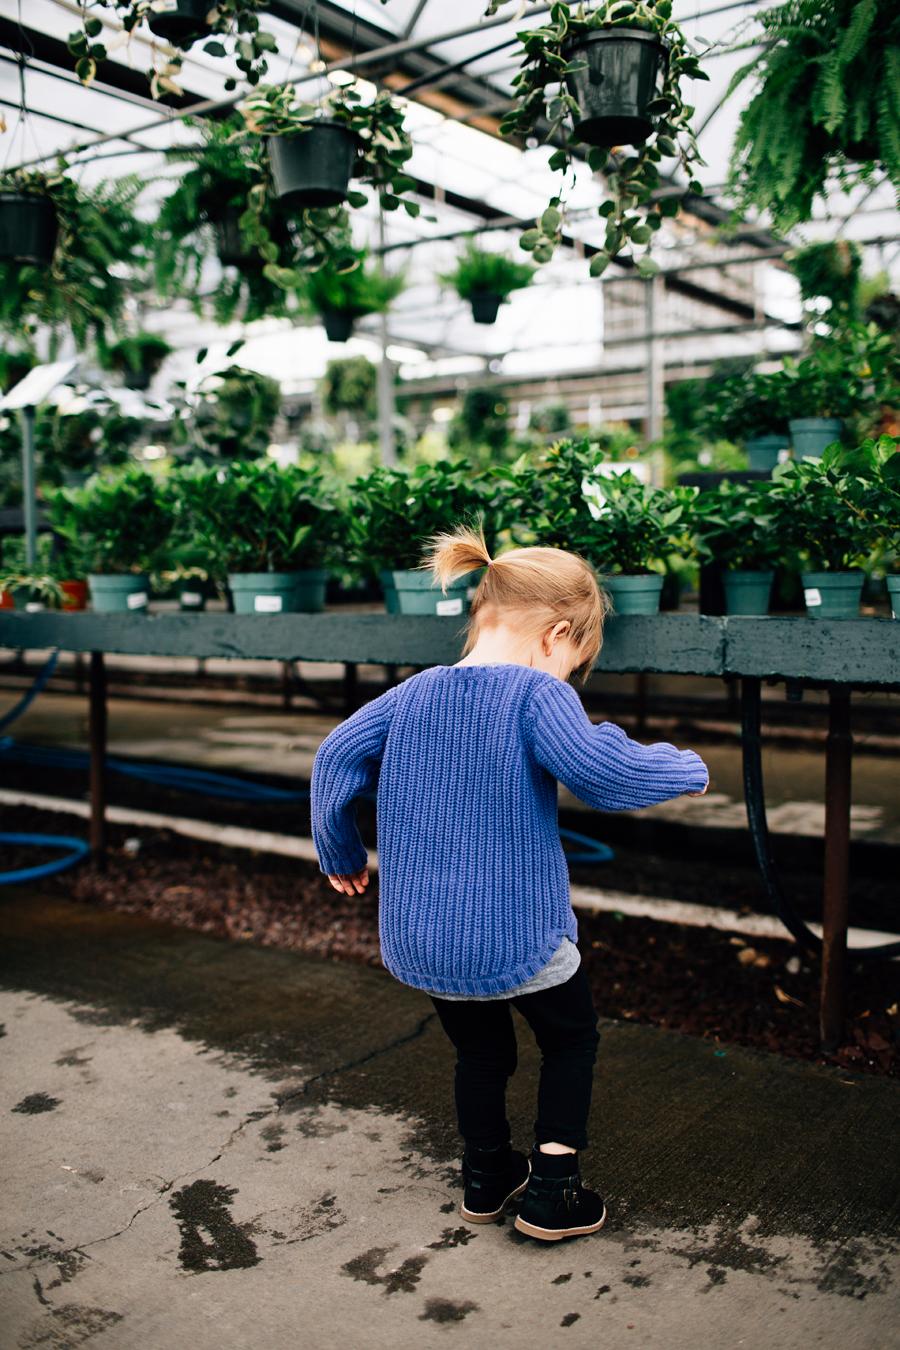 brookecourtney_blog_greenhouse-14.jpg